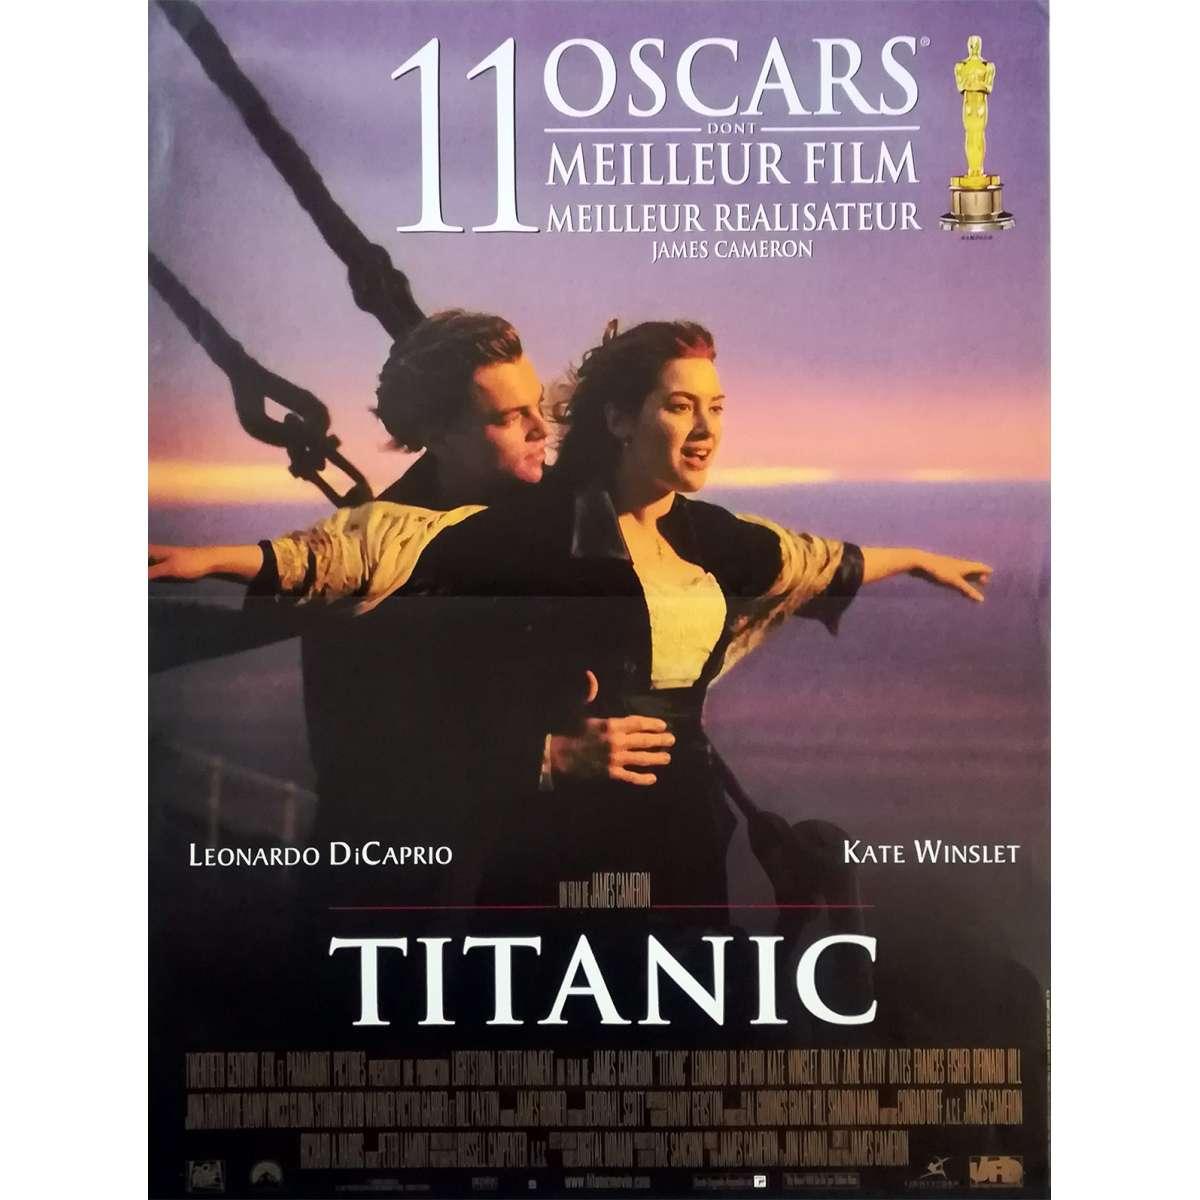 Titanic Movie Poster 15x21 In